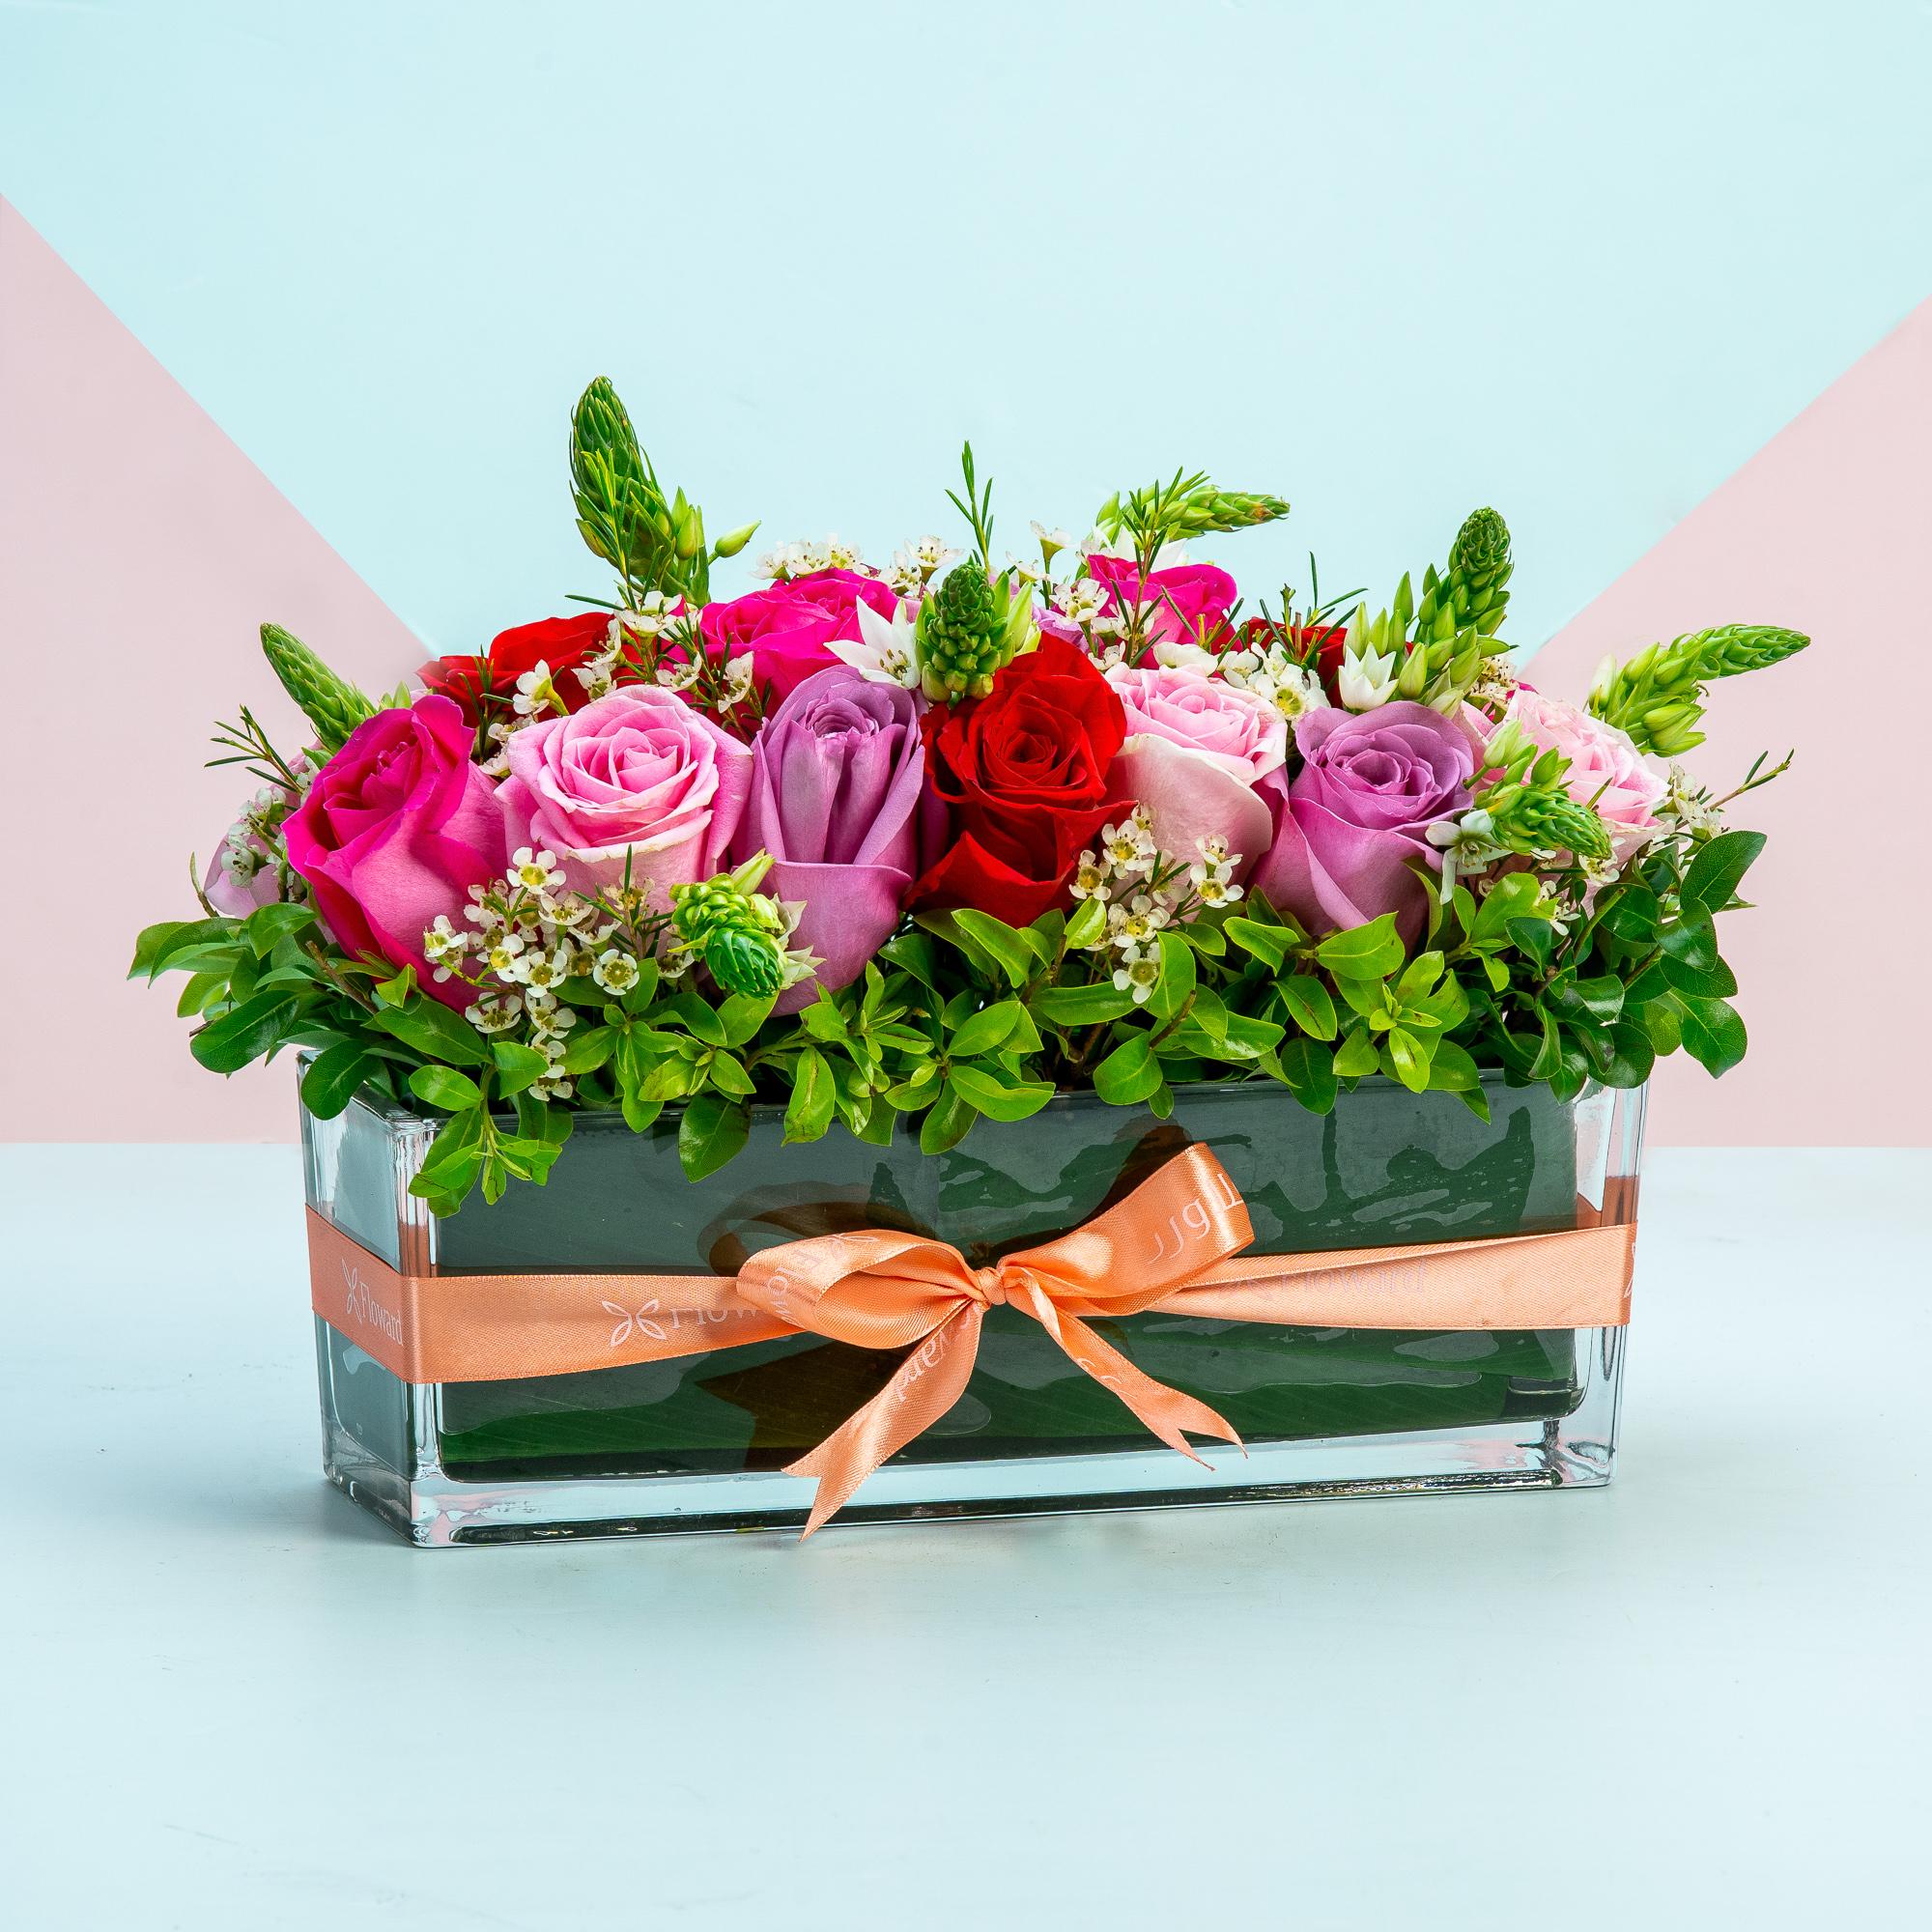 Farah & Aqeel's Flower Block